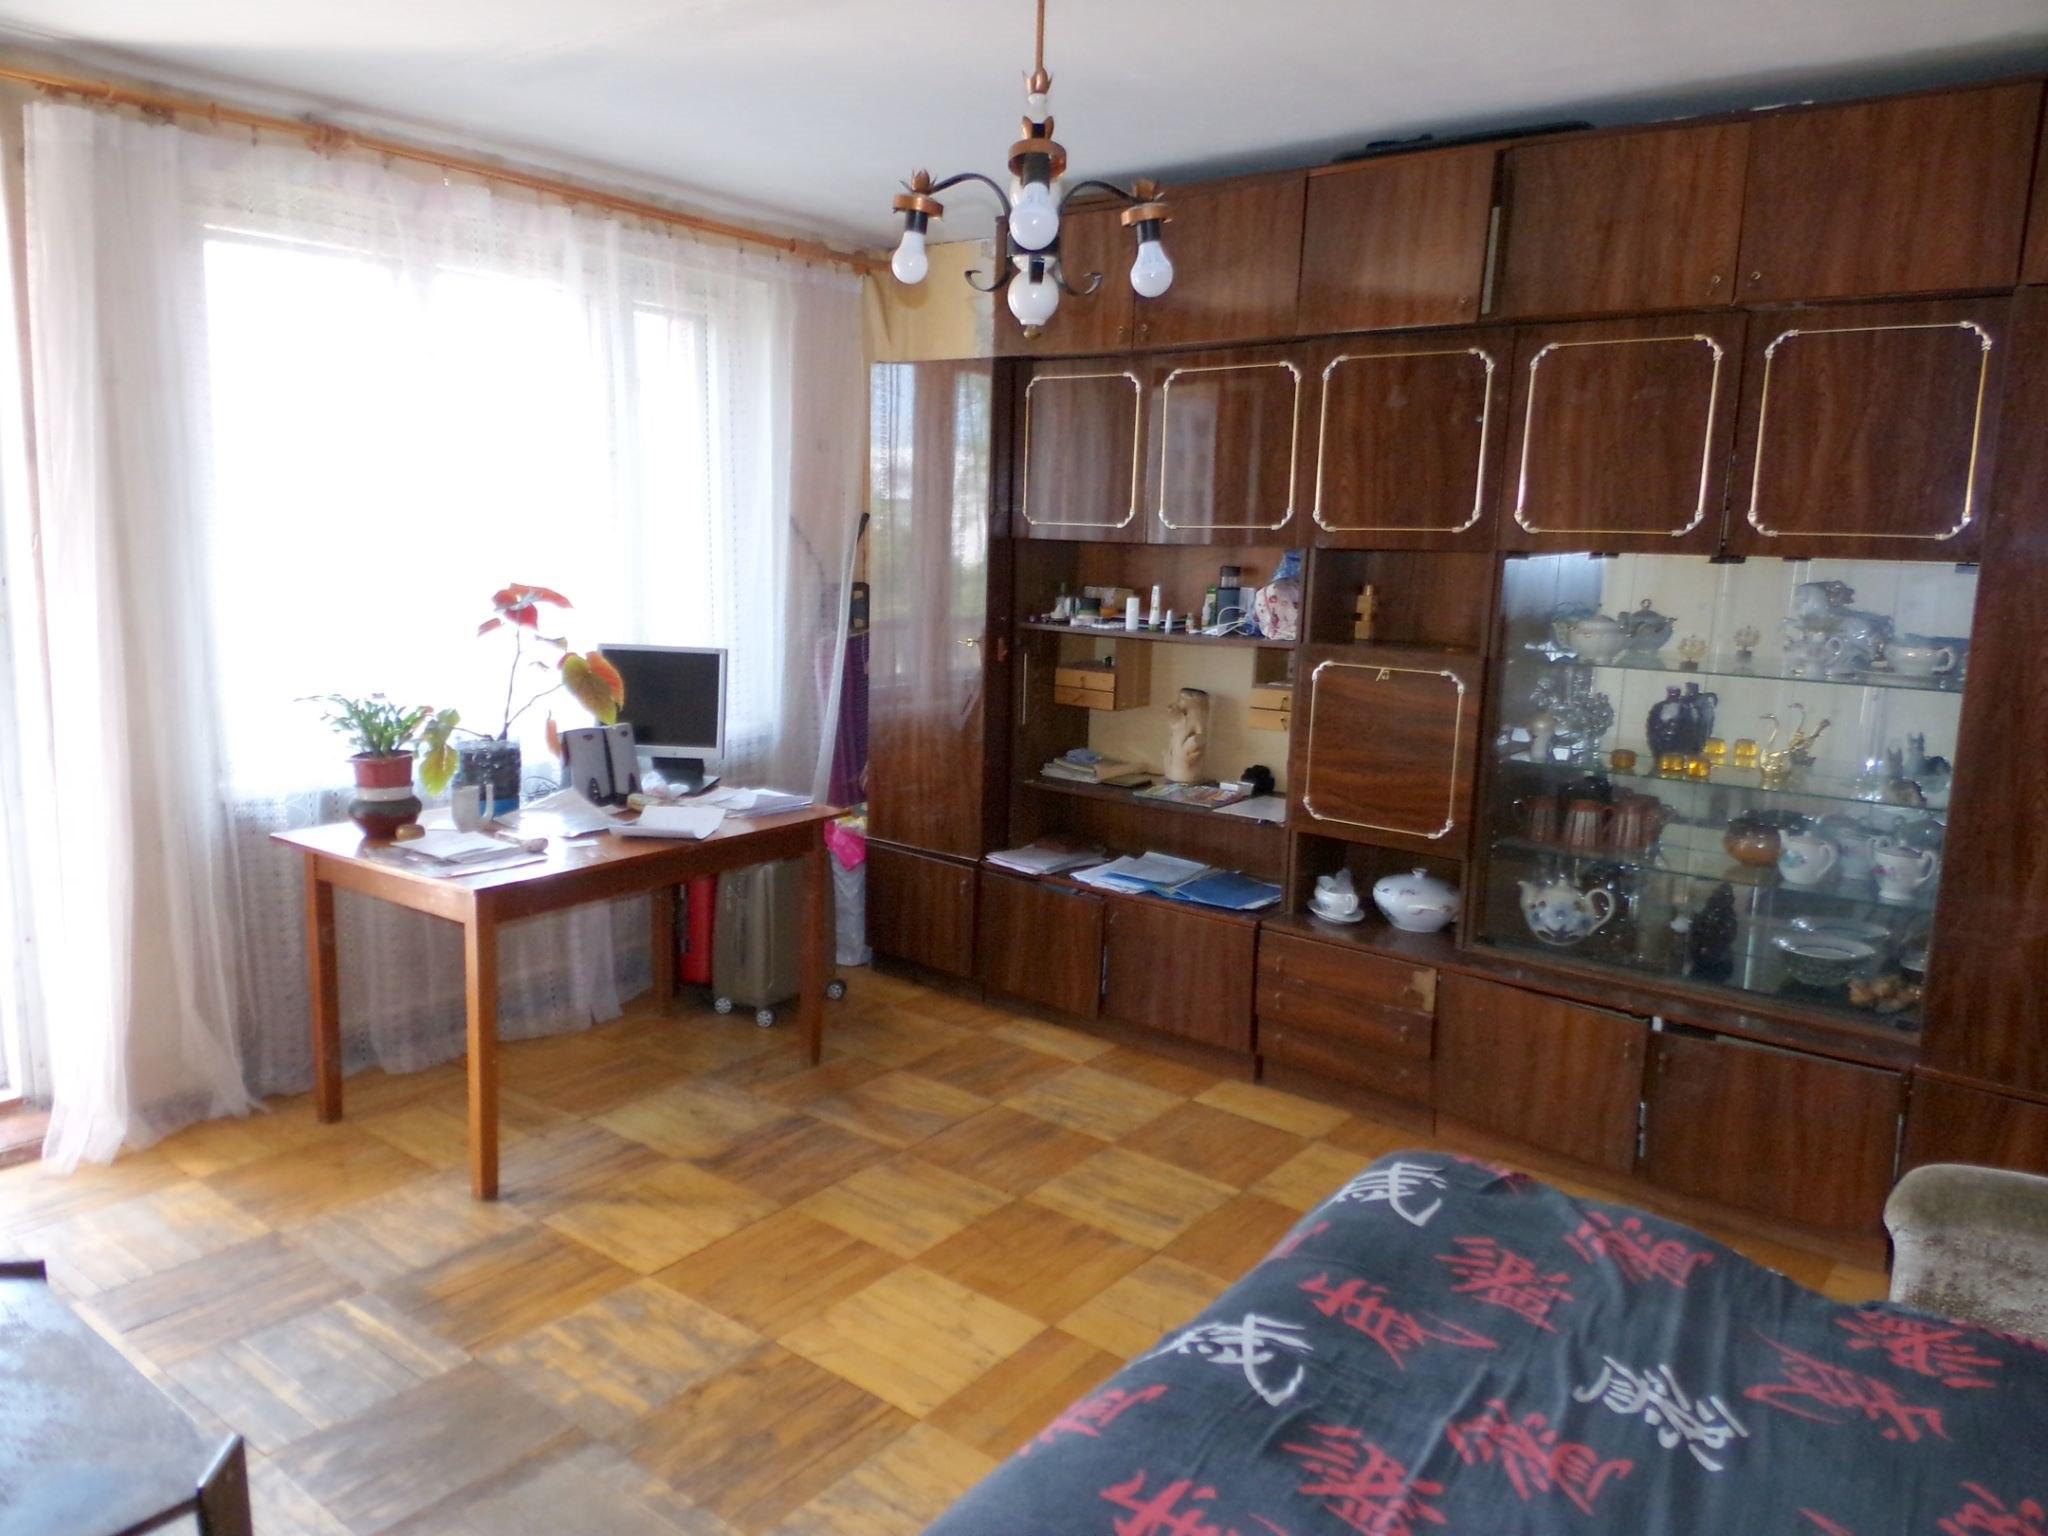 90cf758b2cf80 Купить квартиру на улице Сикейроса в Санкт-Петербурге: 48 объявлений ...